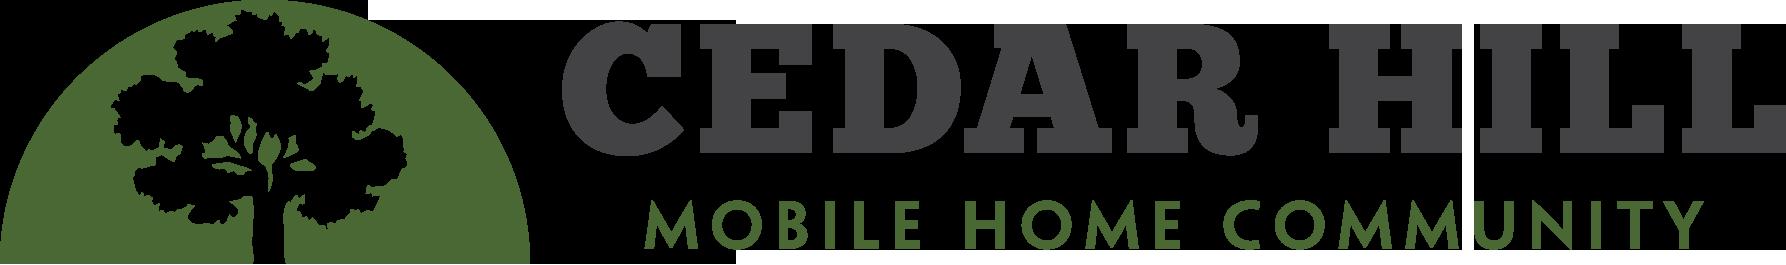 Cedar Hill Estates Home Community